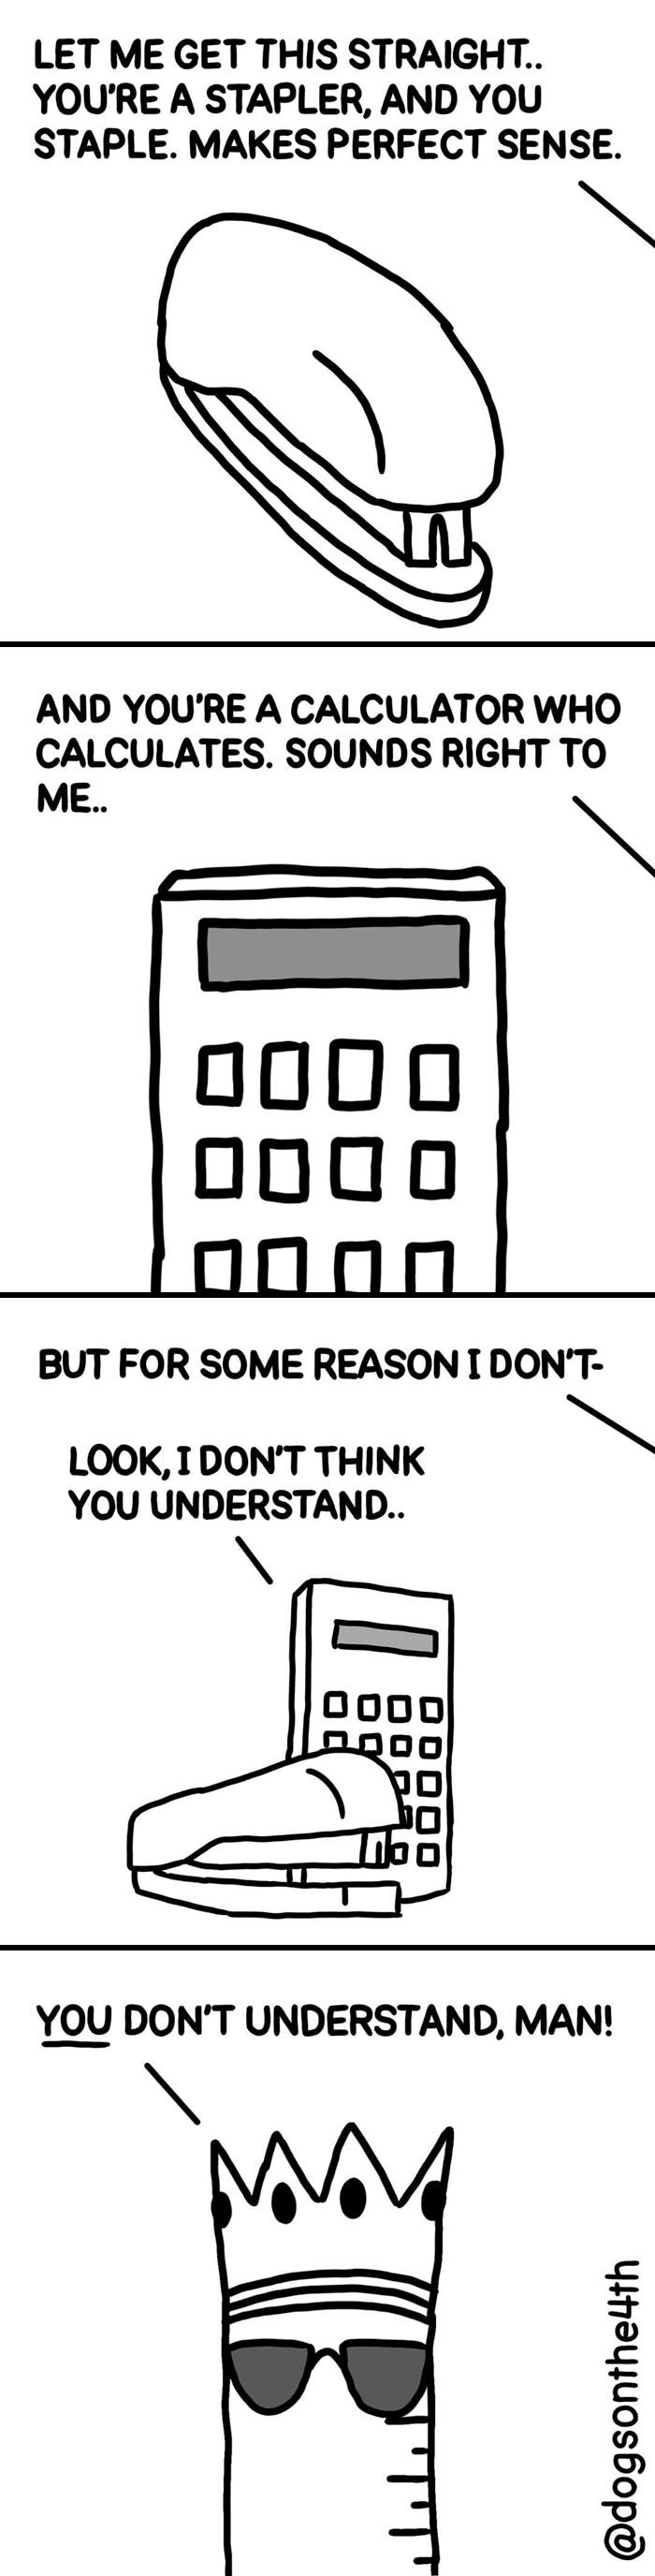 Funny-Comics-Dogsonthe4th